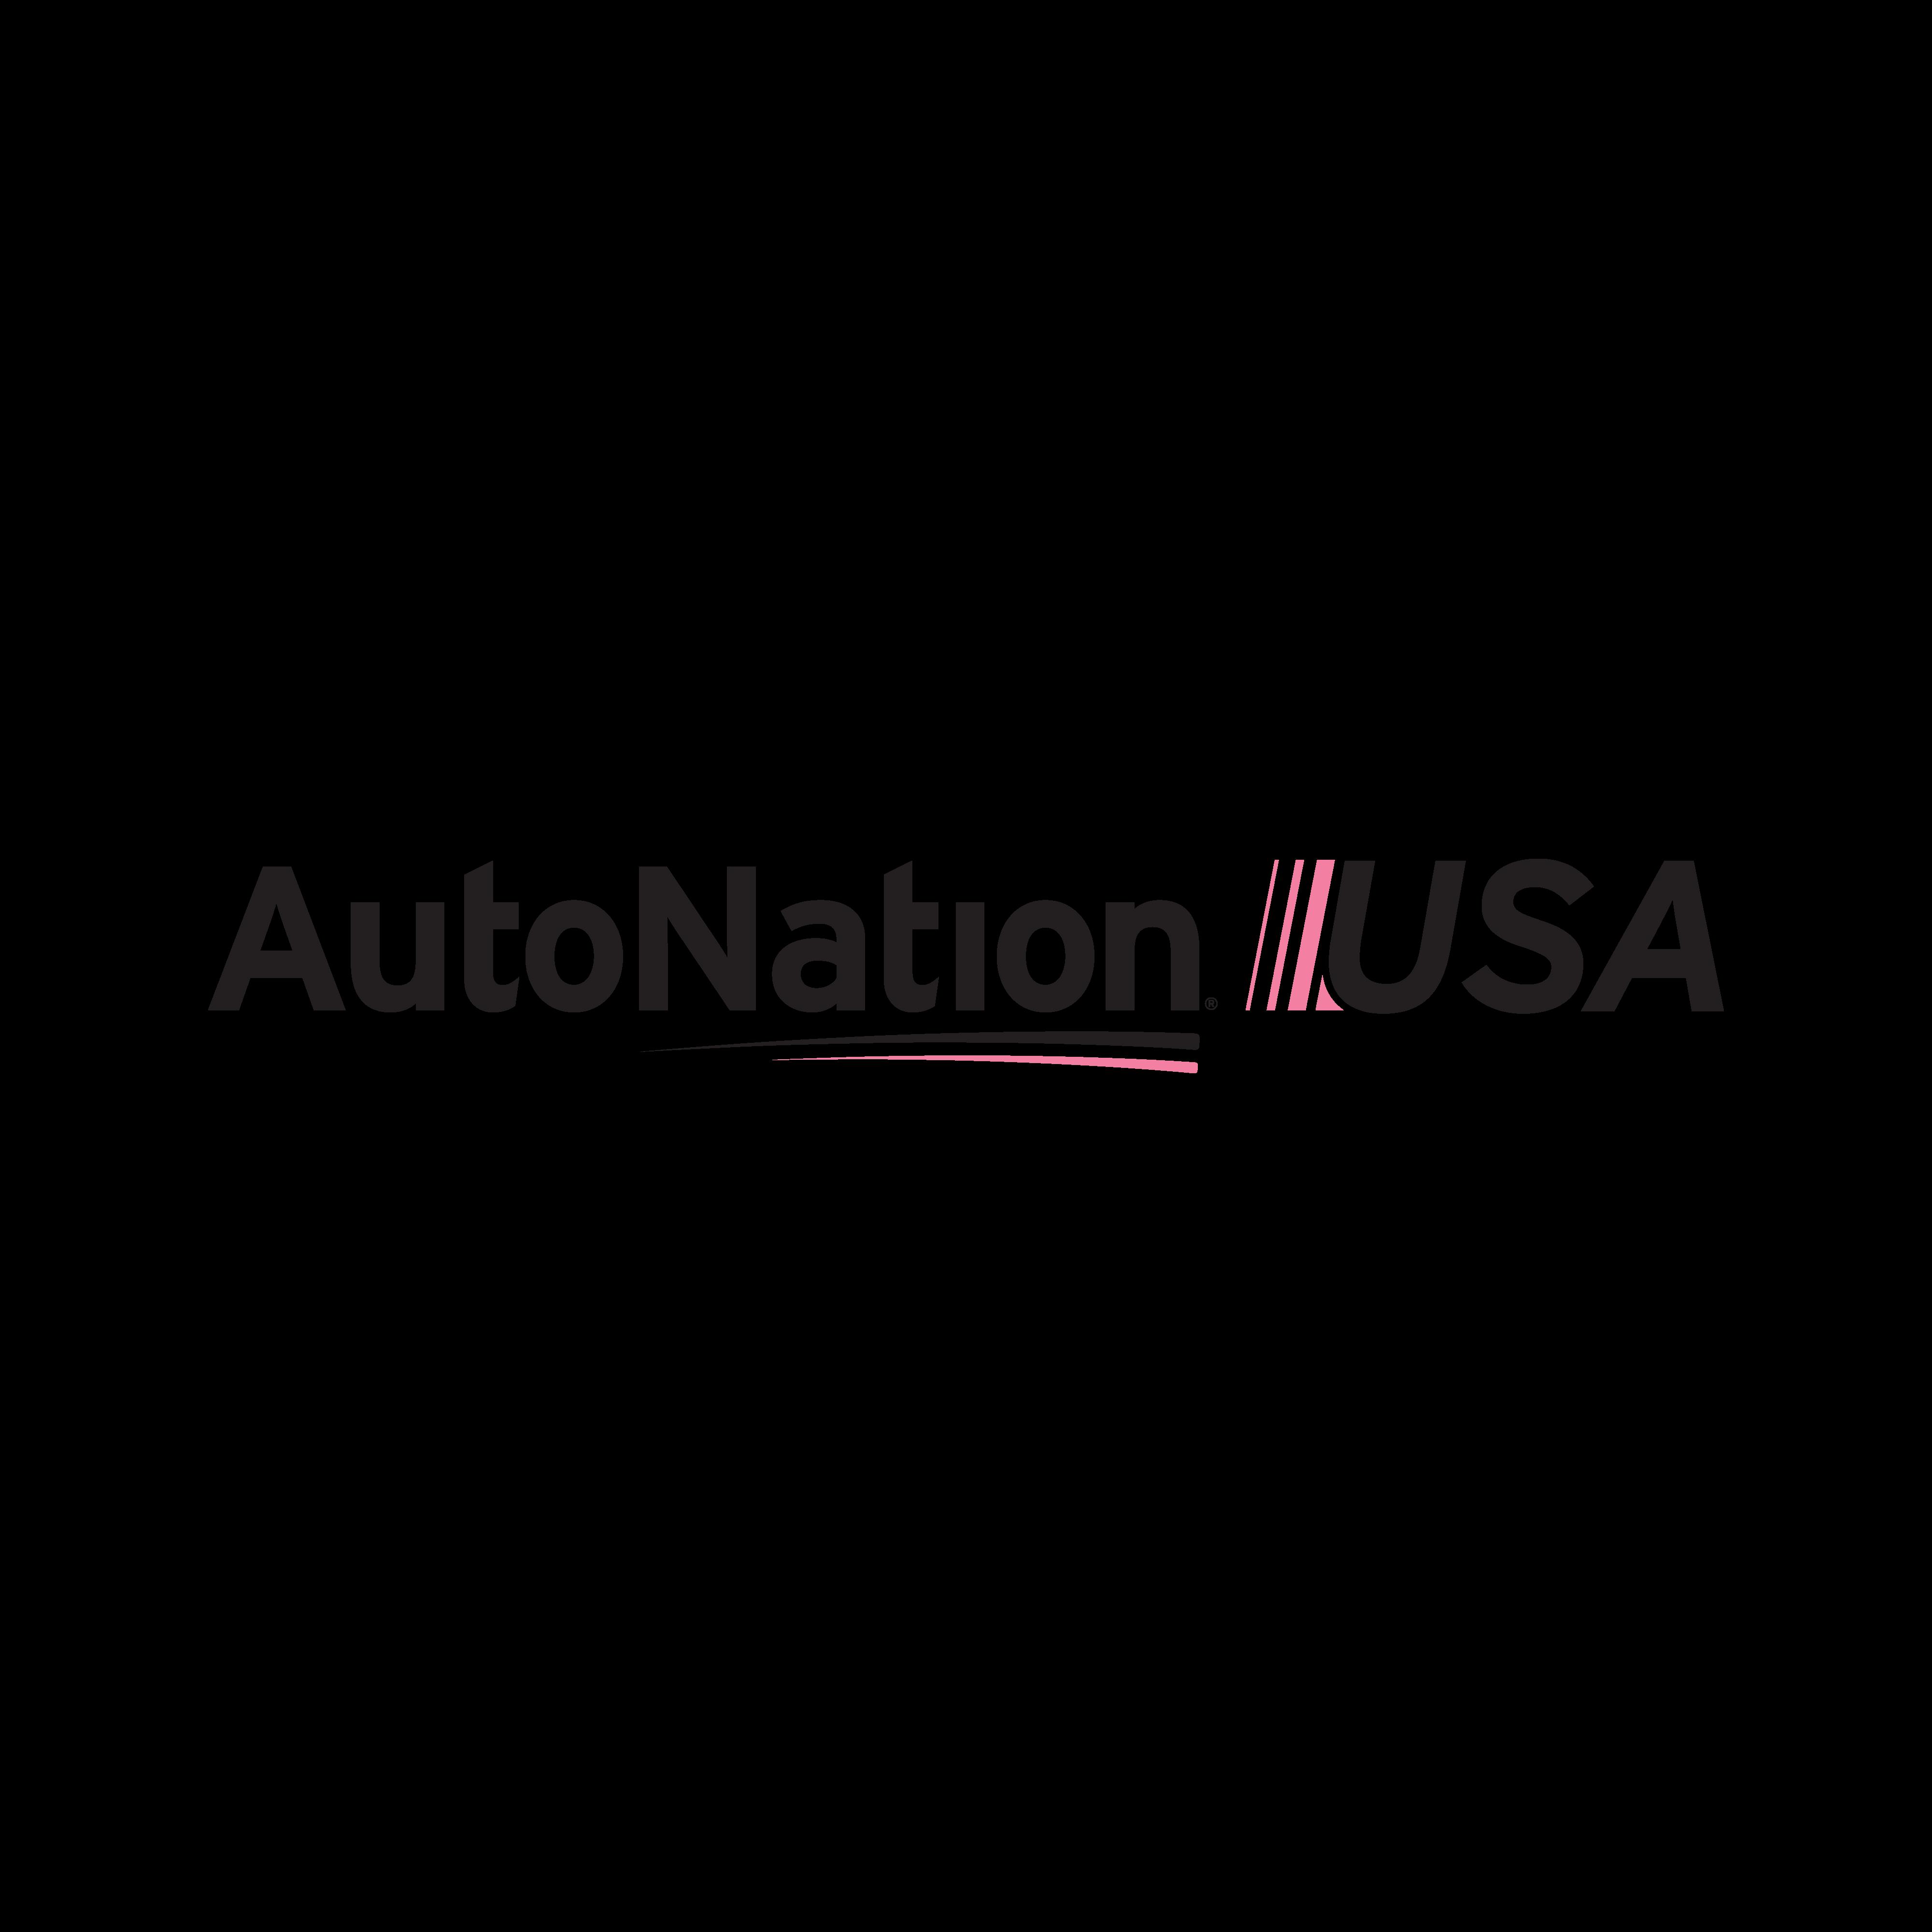 AutoNation USA Katy